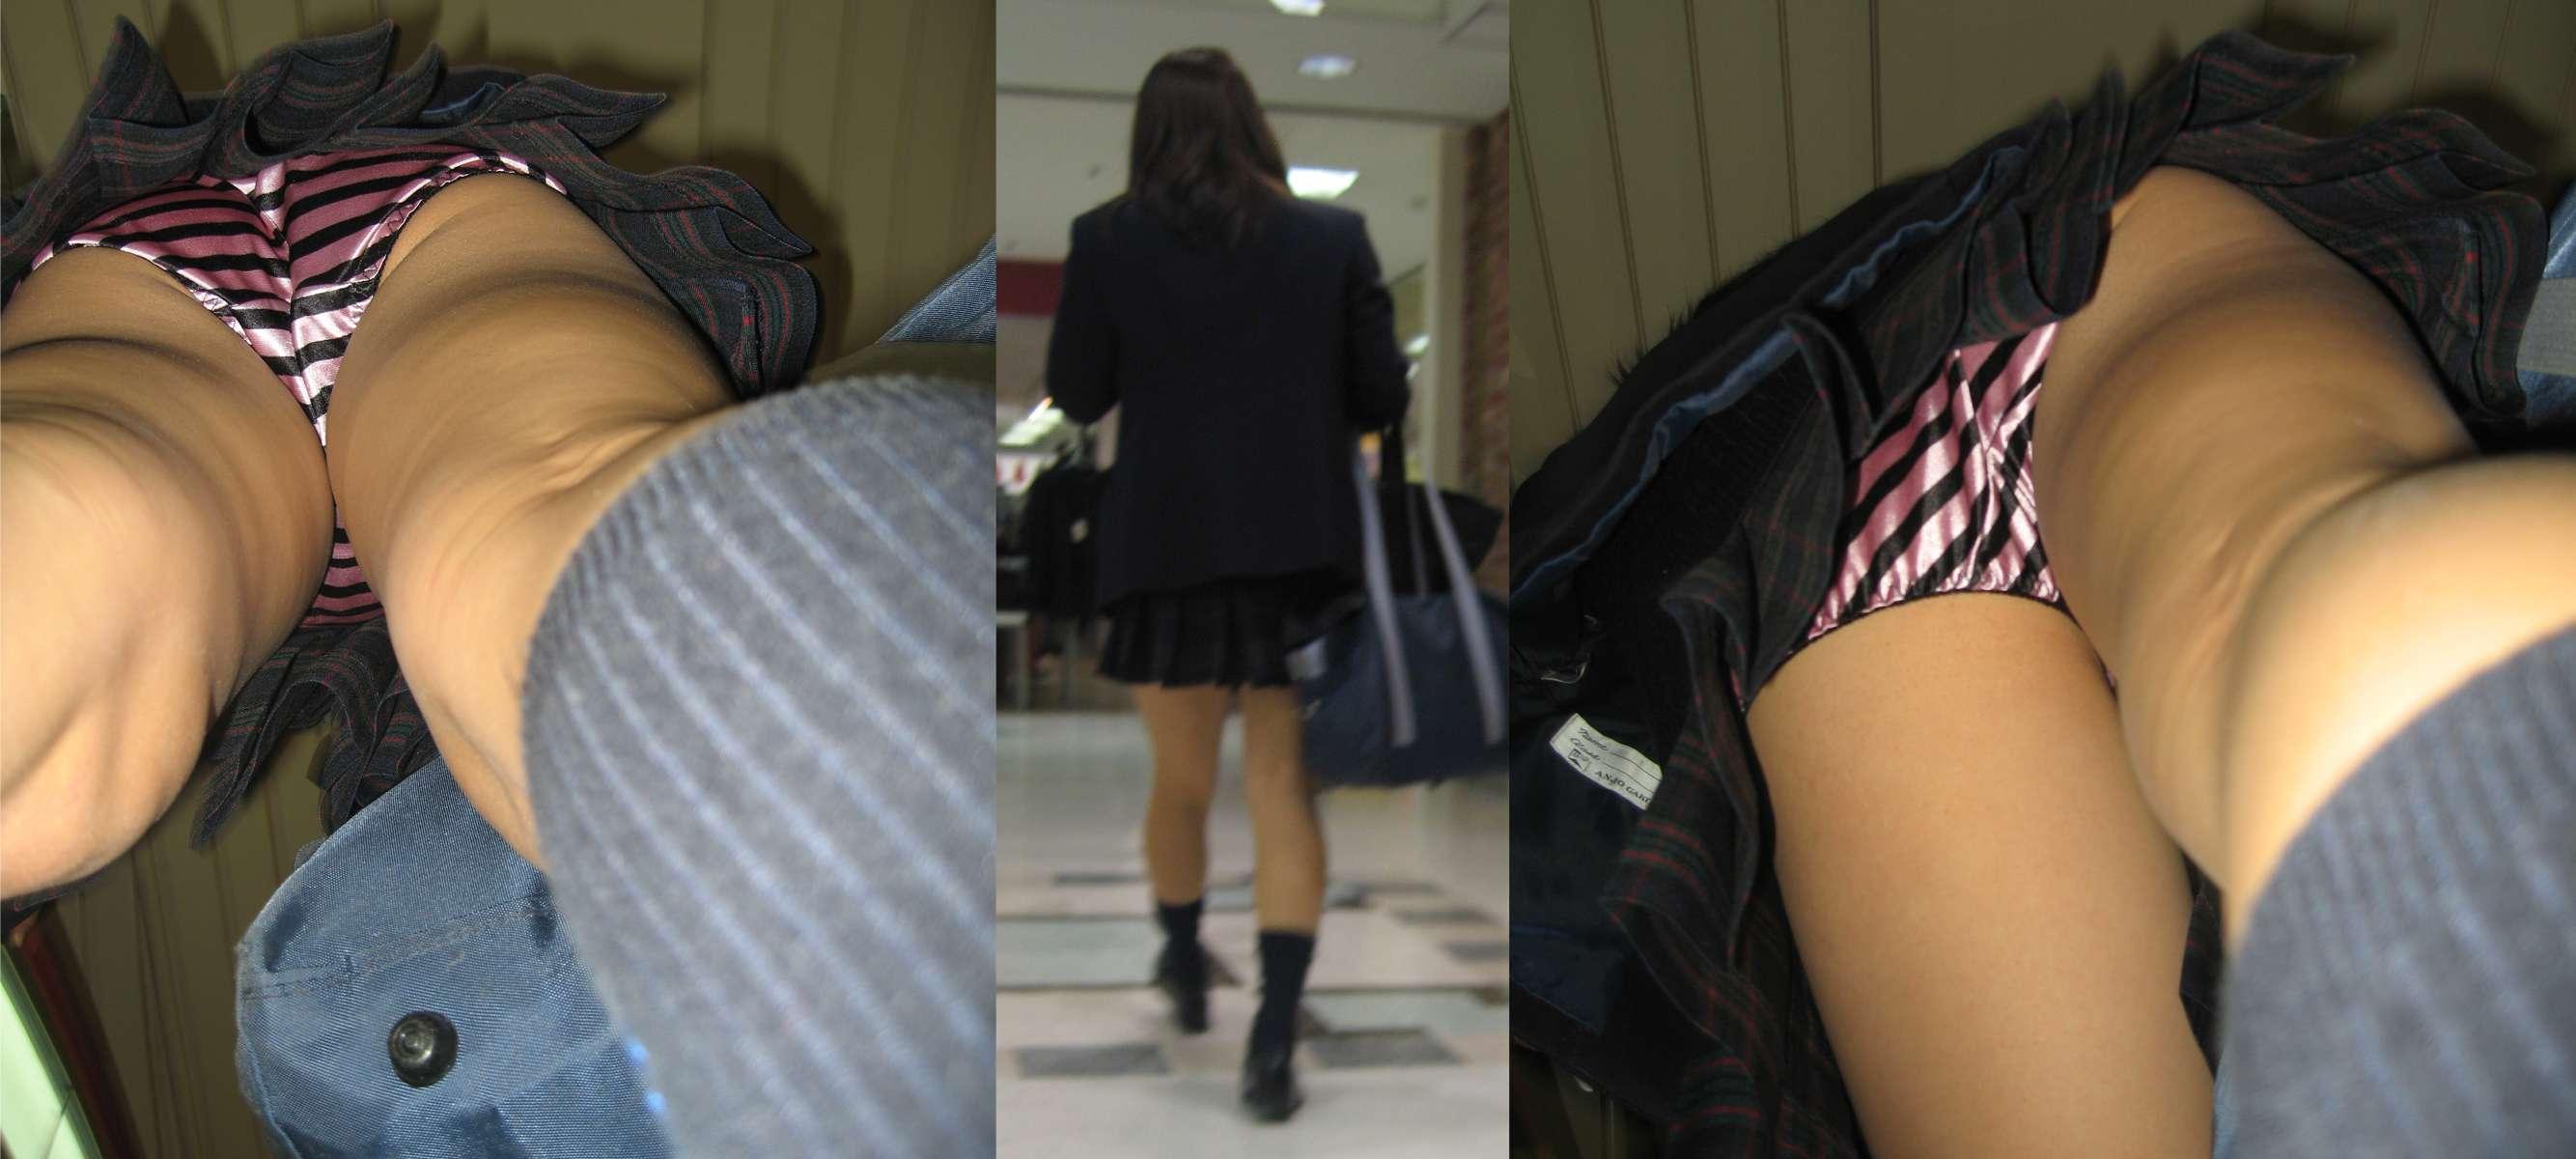 【JK逆さ撮りエロ画像】子供だと思ったら超ビッチ!女子高生の逆さ撮りパンツが派手すぎるwwww その12